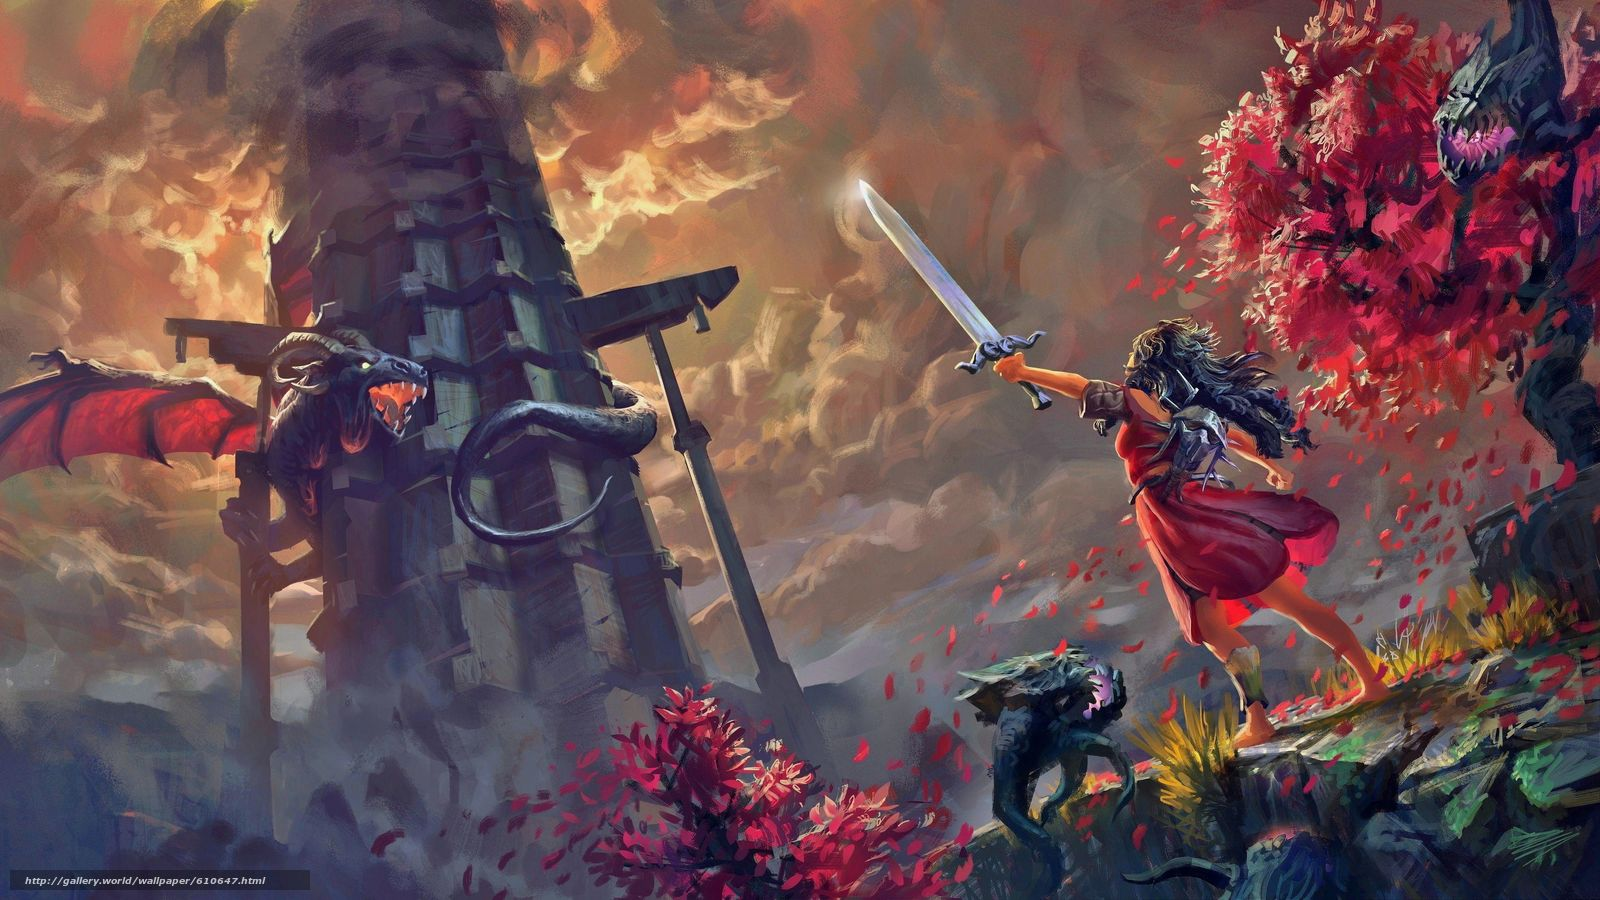 Download wallpaper Toren,  taking a climb,  girl,  Sword free desktop wallpaper in the resolution 3985x2241 — picture №610647